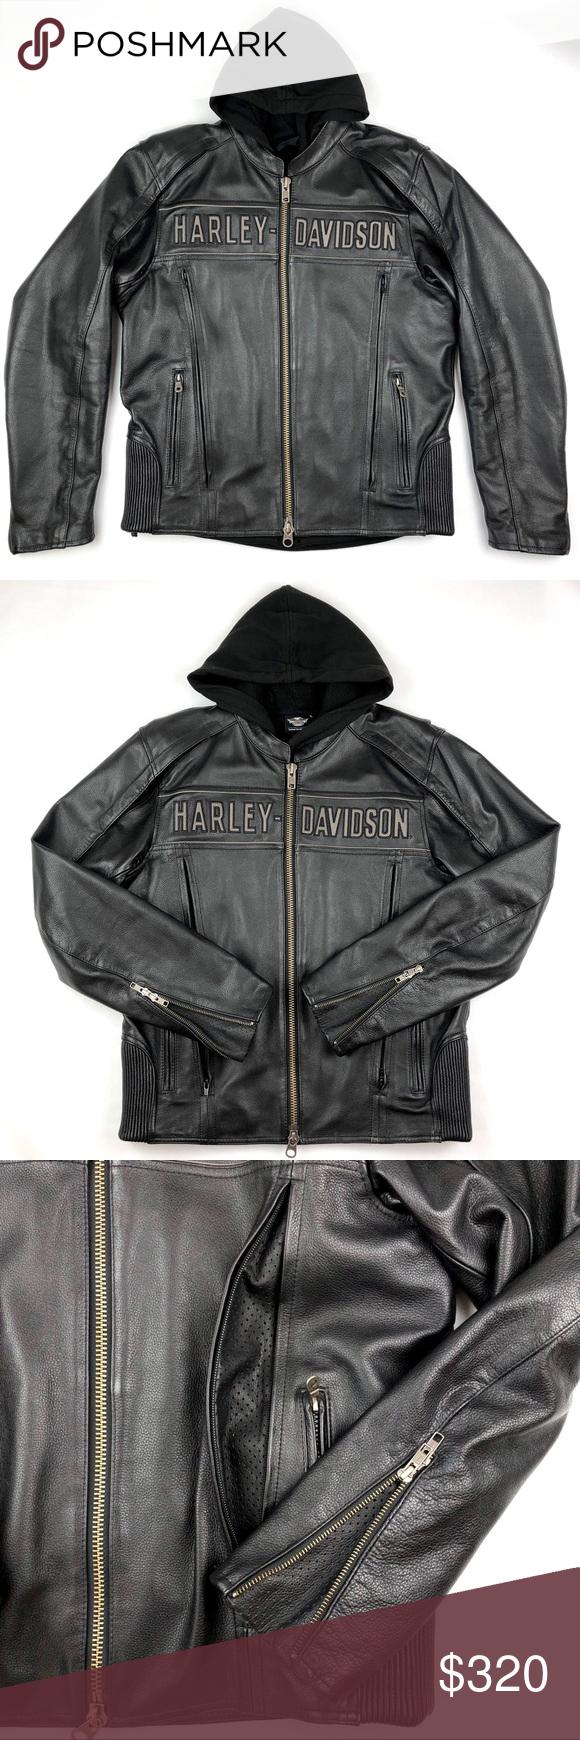 HARLEY DAVIDSON Men Genuine Leather Riding Jacket Genuine